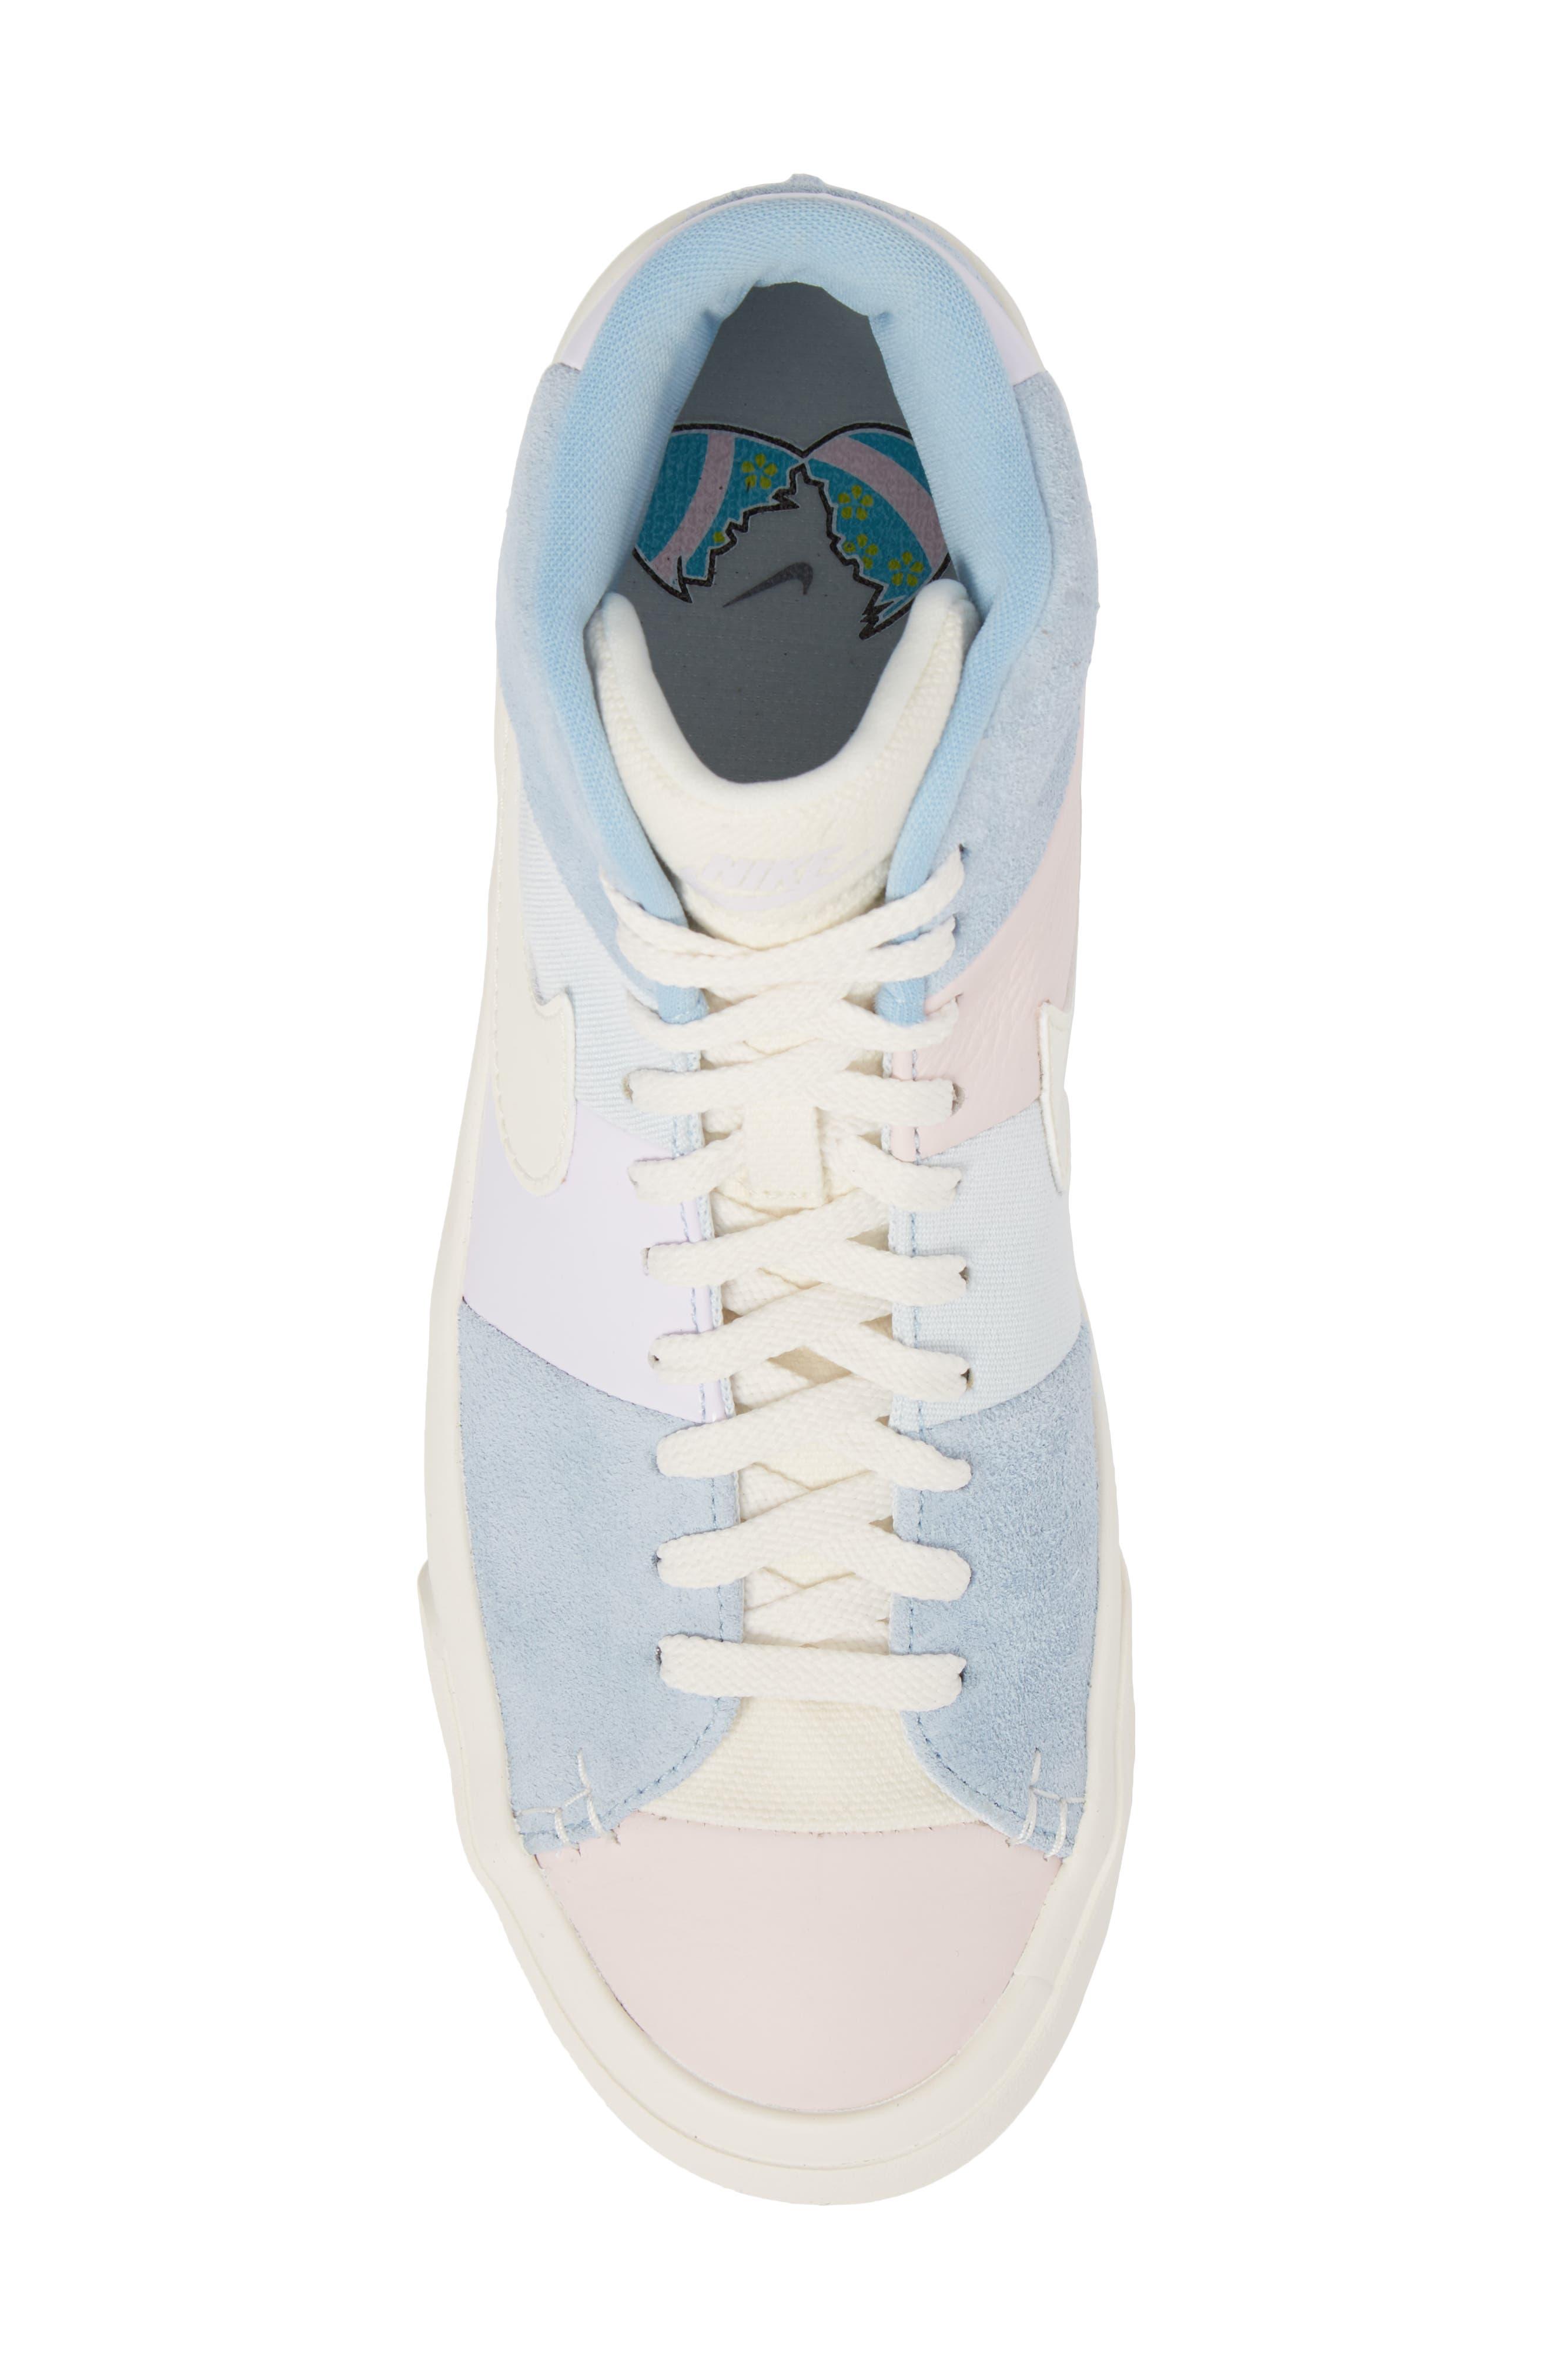 Blazer Royal Easter QS High Top Sneaker,                             Alternate thumbnail 5, color,                             Arctic Pink/ Sail-Blue-Blue